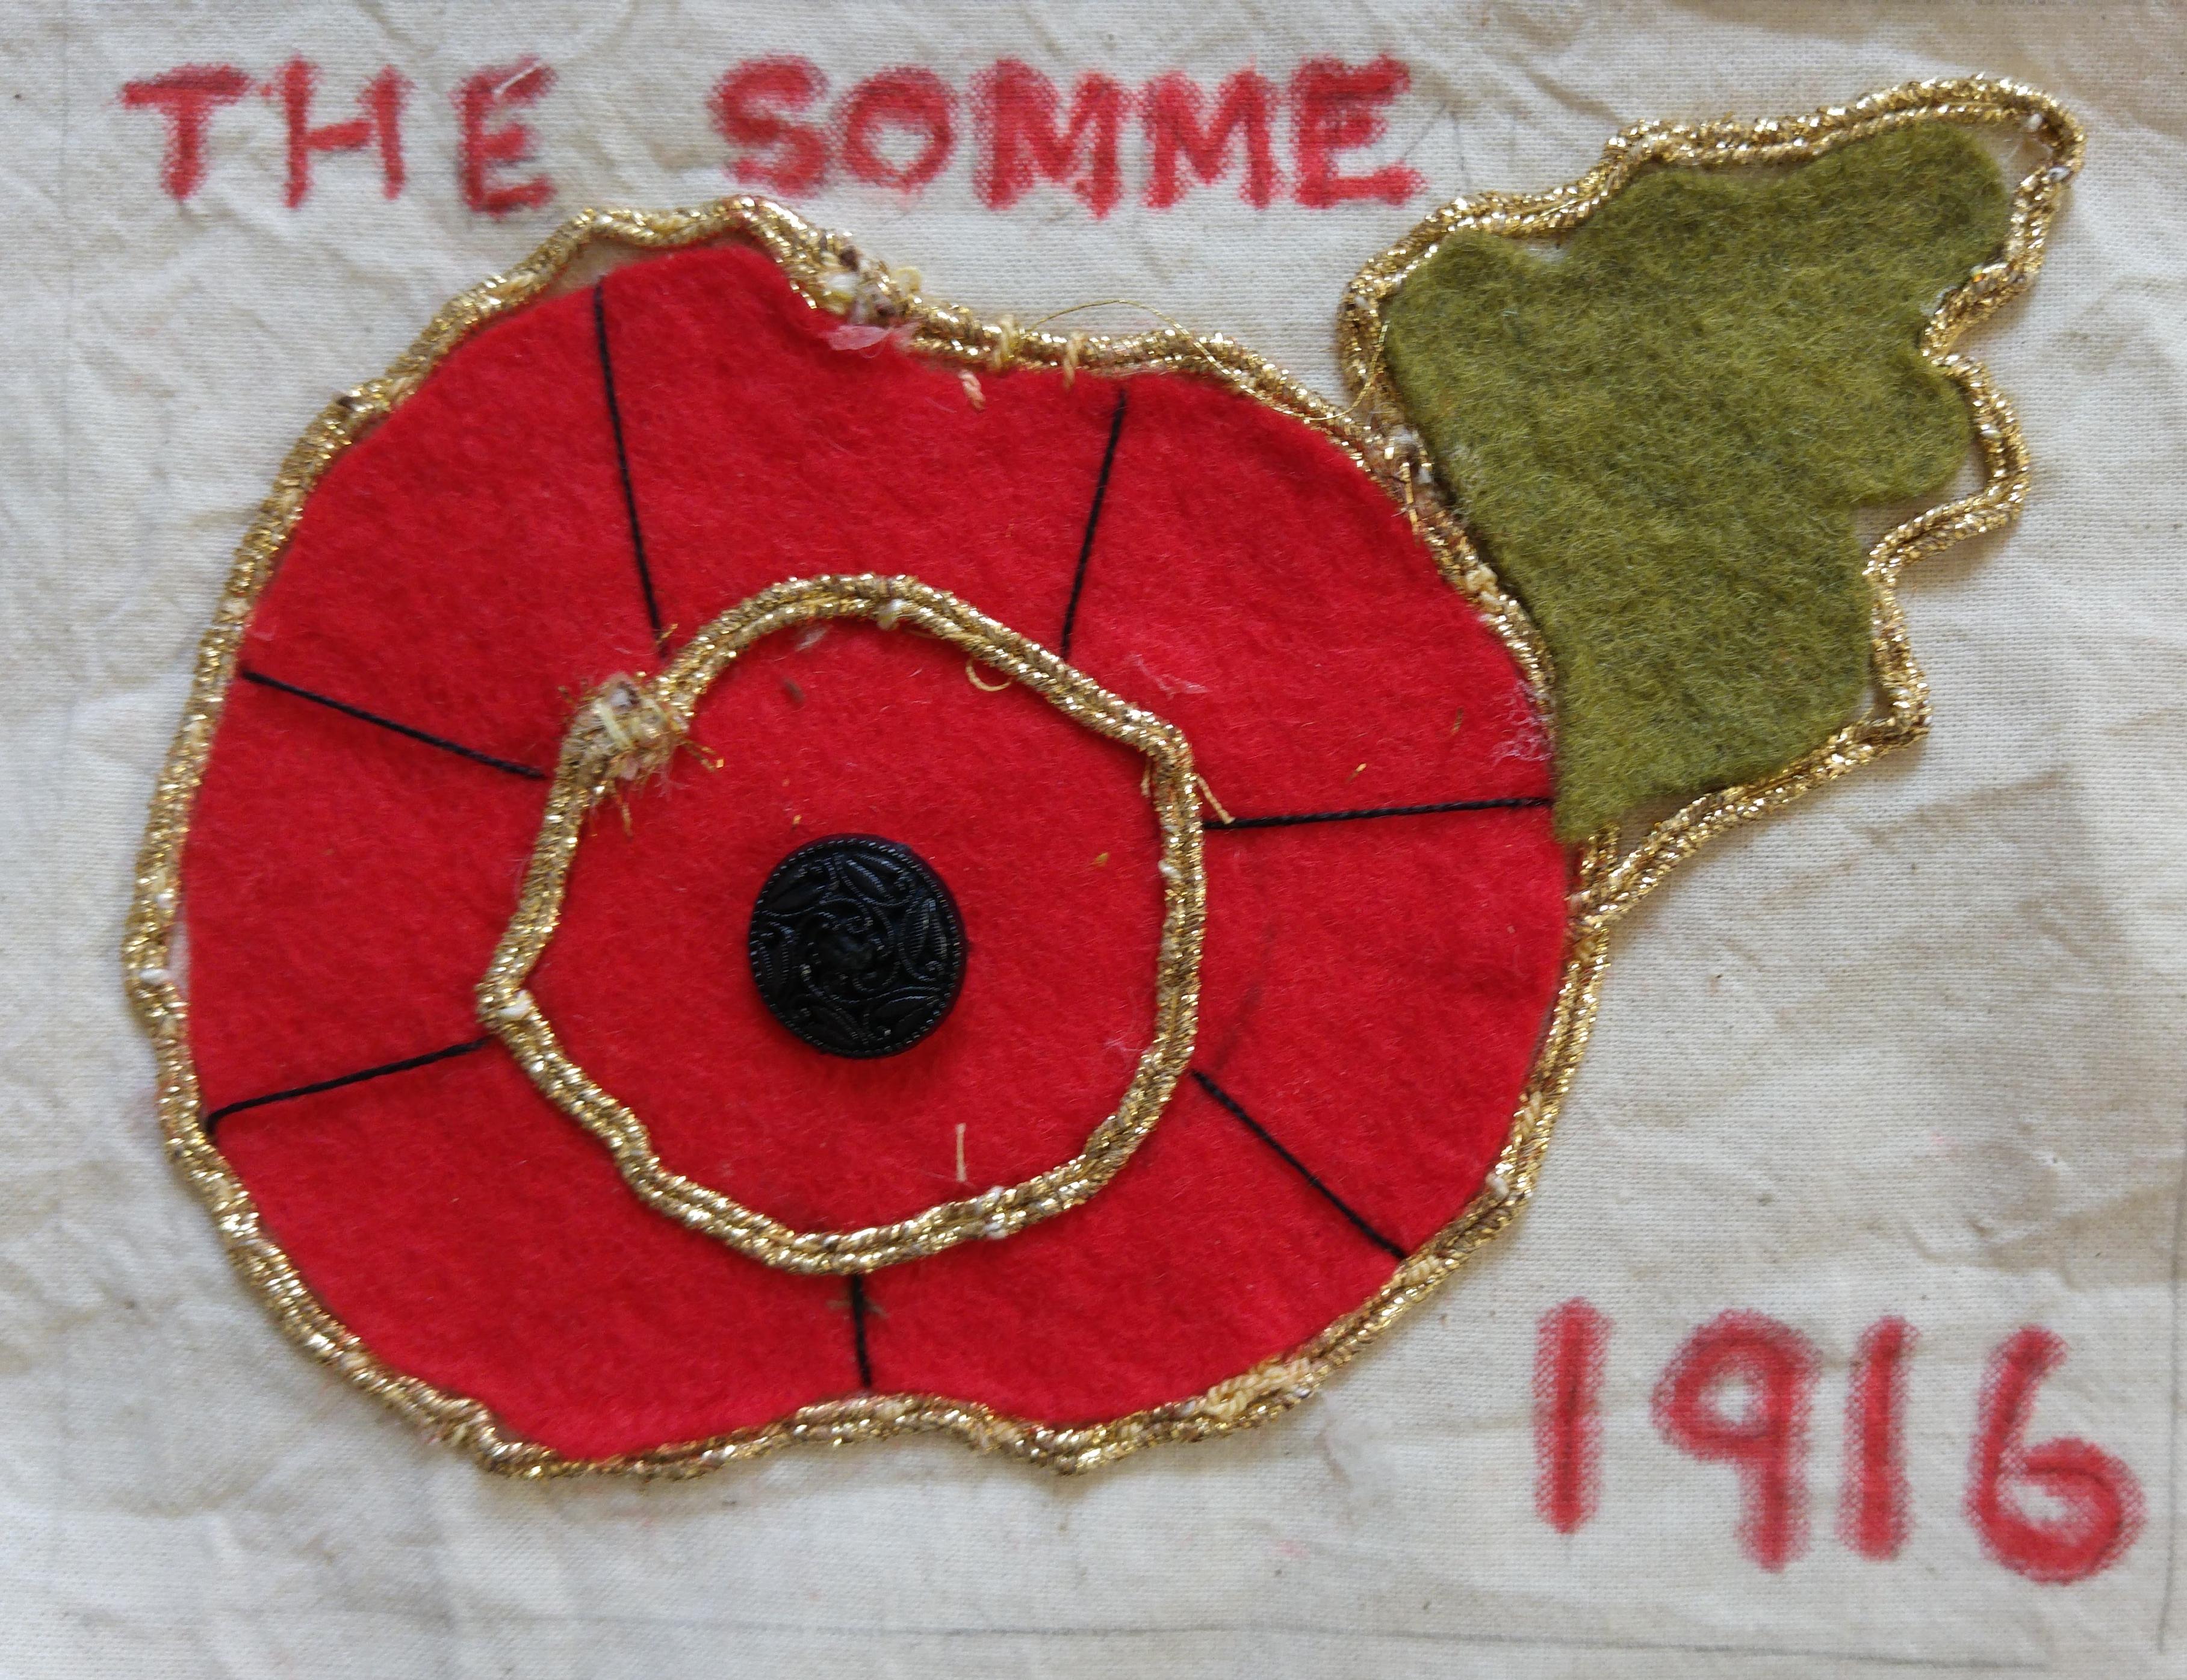 Somme 100 Commemorative Quilt